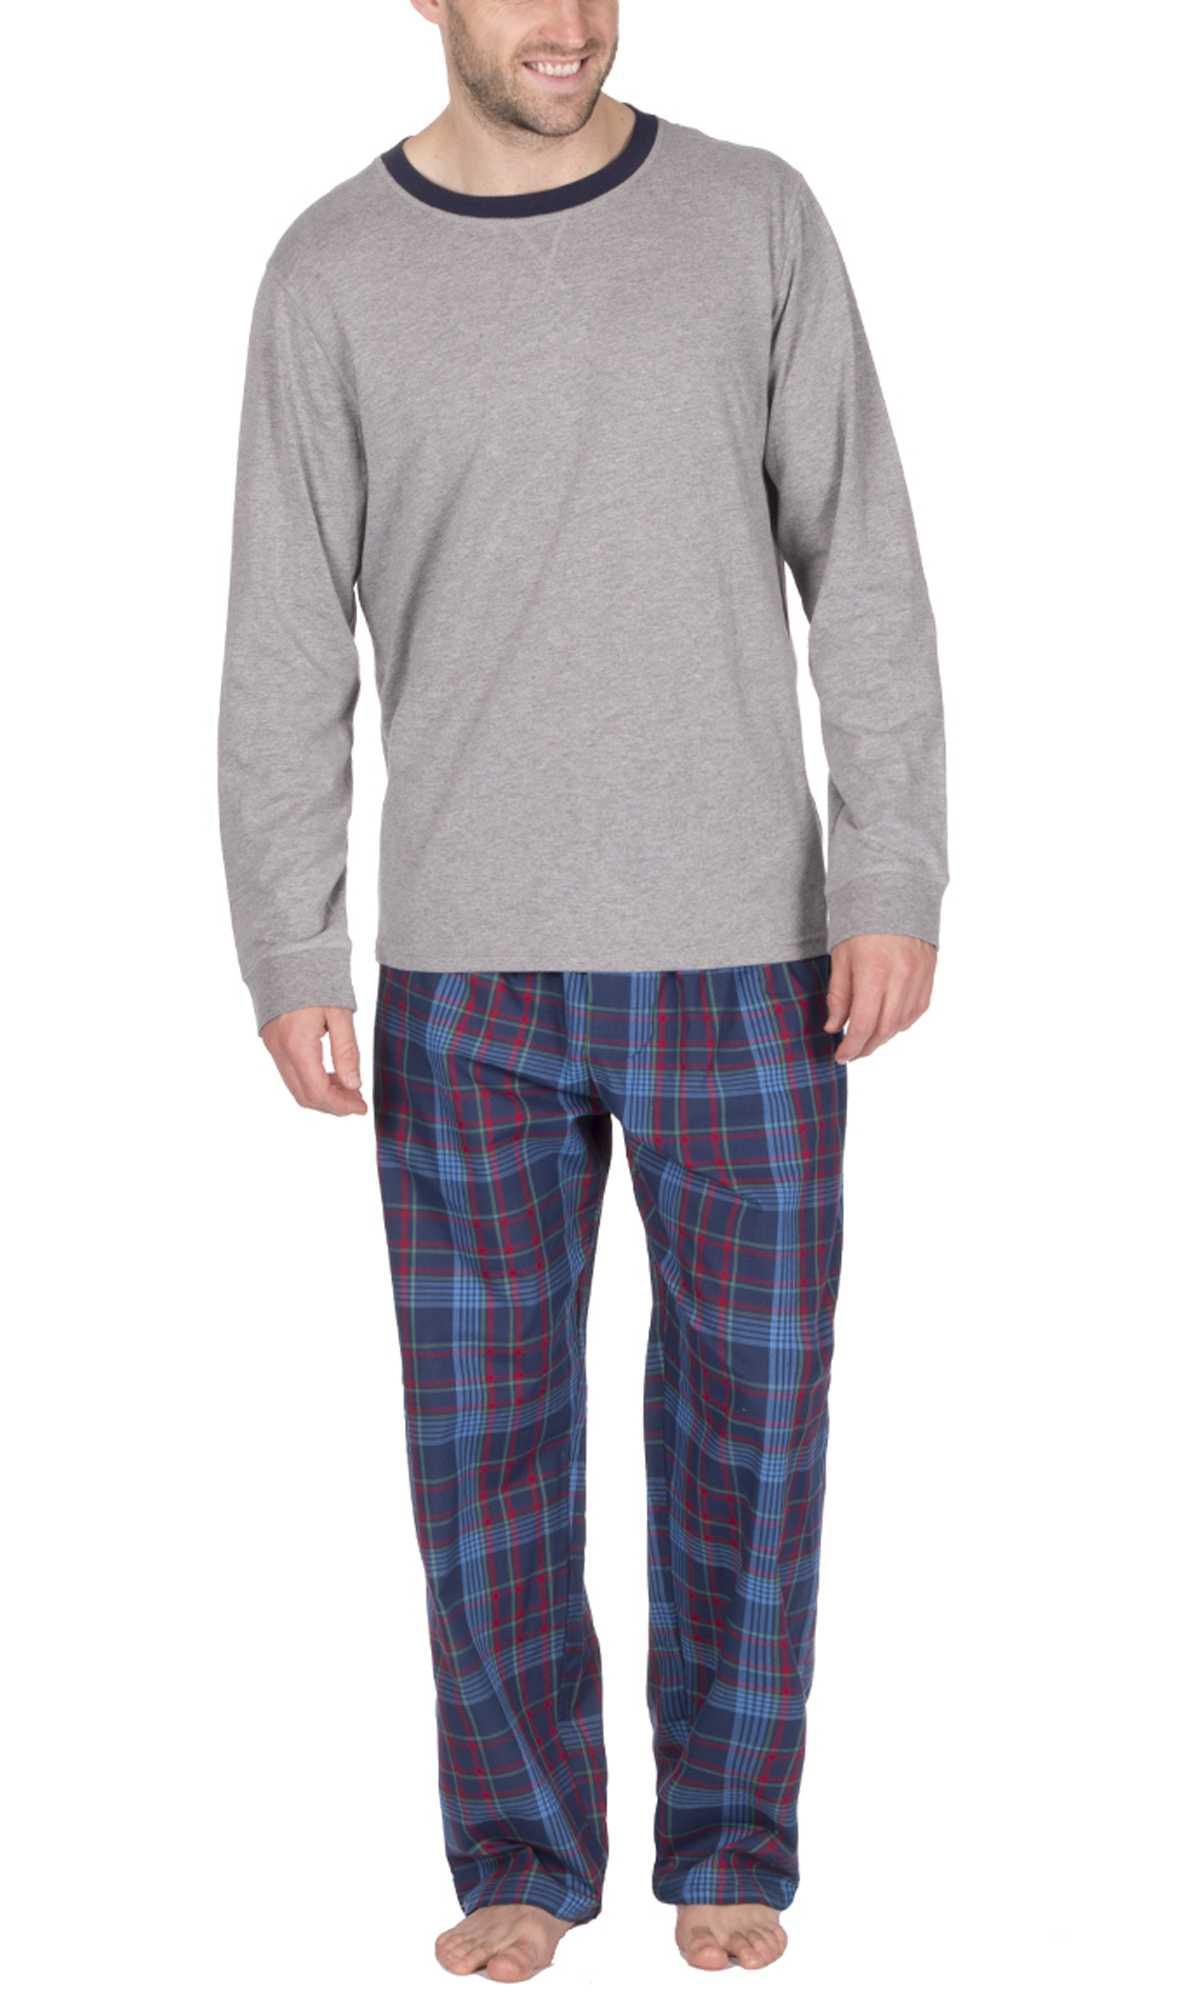 Mens Warm Fleece Jersey Winter PJ Pyjama Set Night Wear PJ\'s Pyjamas ...